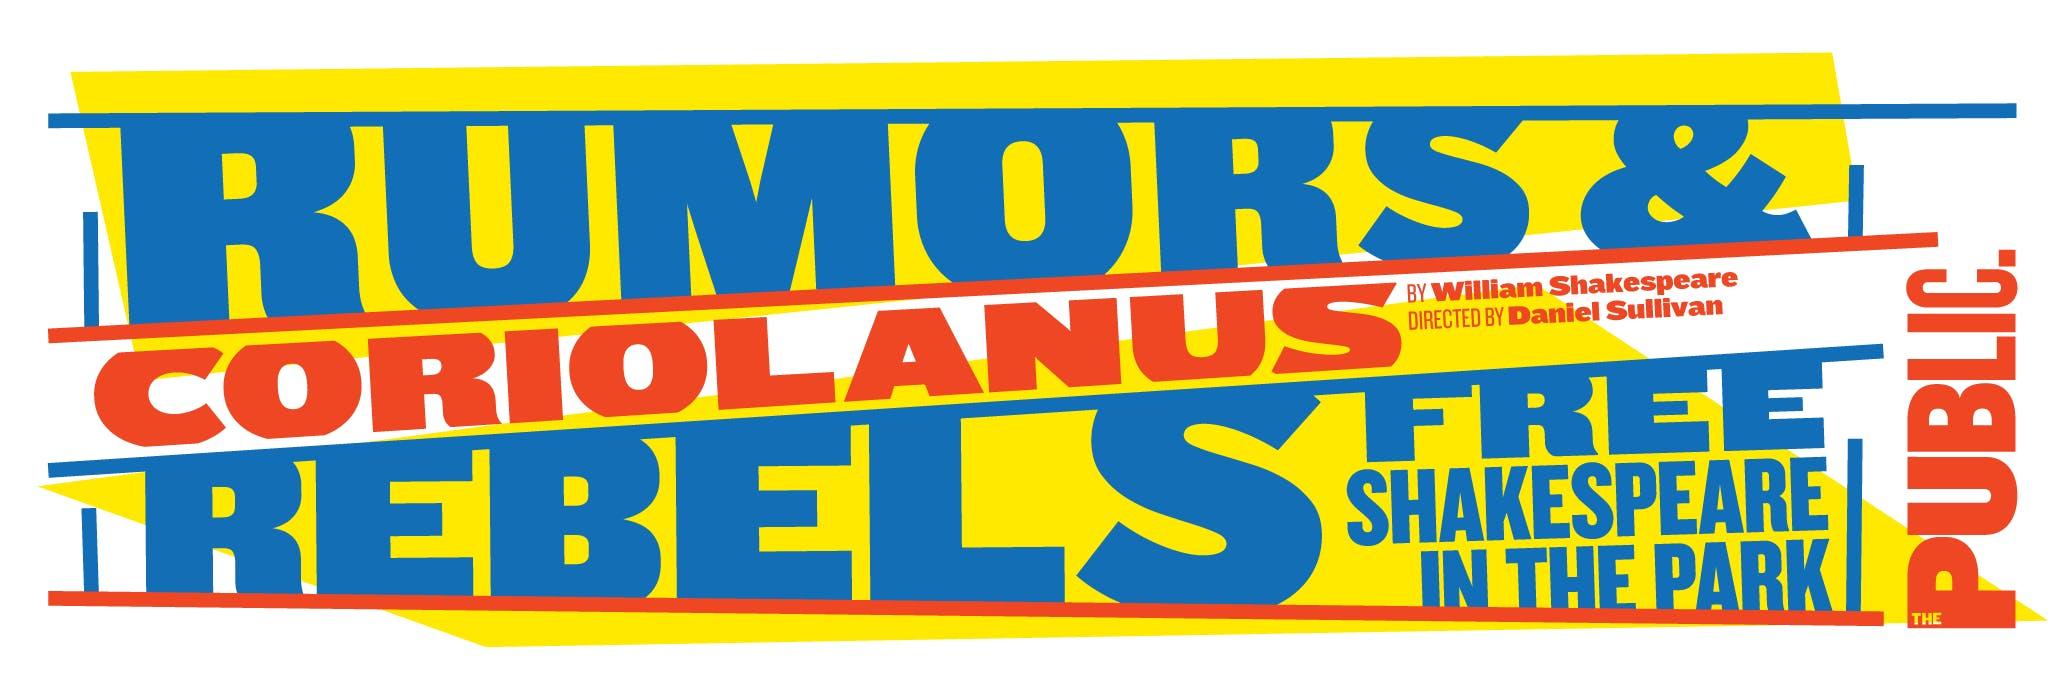 Coriolanus - ADA Accessible Logo